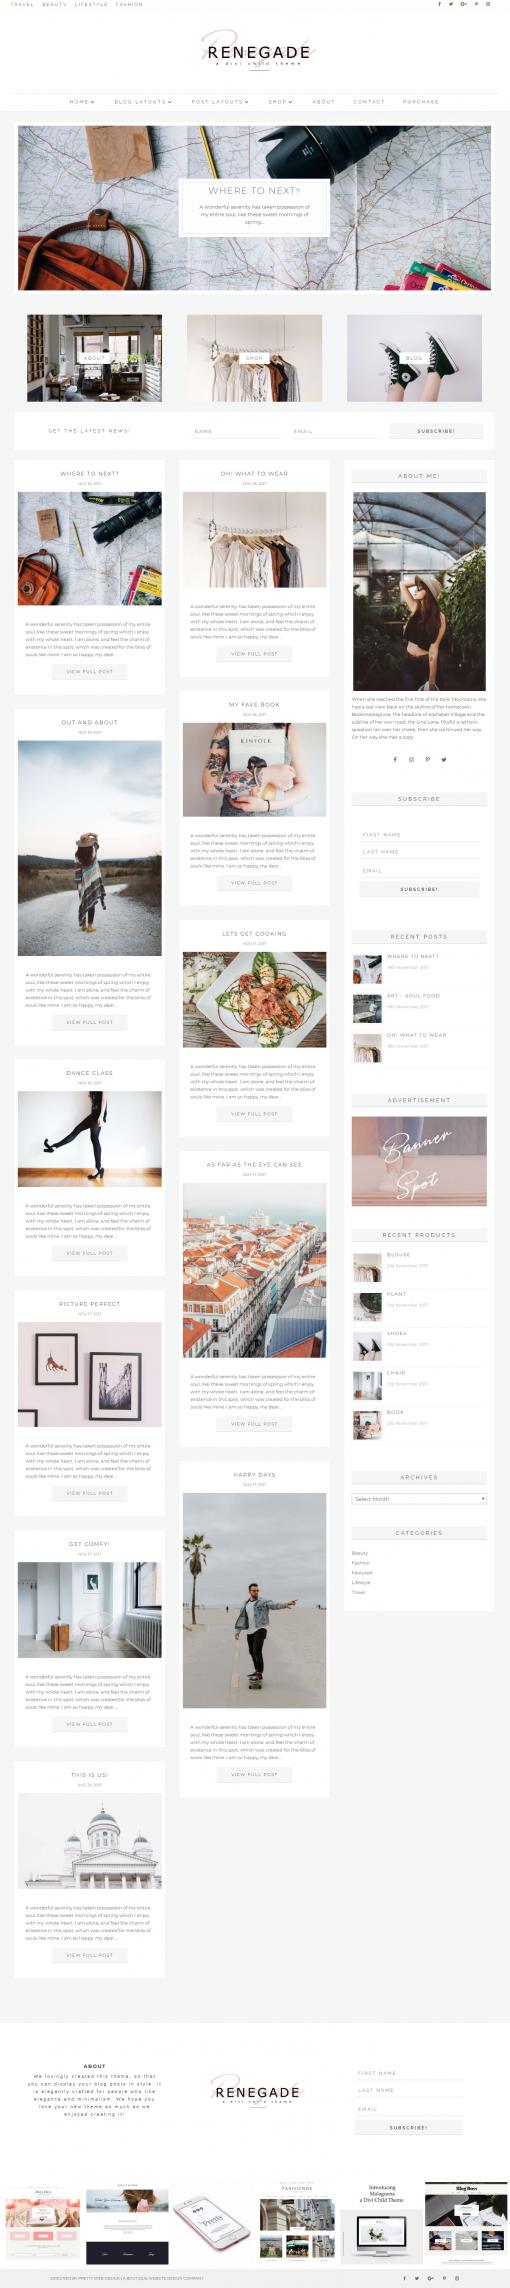 Divi child theme layouts I Feminine WordPress themes I Divi child themes for the bloggers. Feminine Divi WordPress themes for photographers, weddings Divi Child Themes for the Divi theme